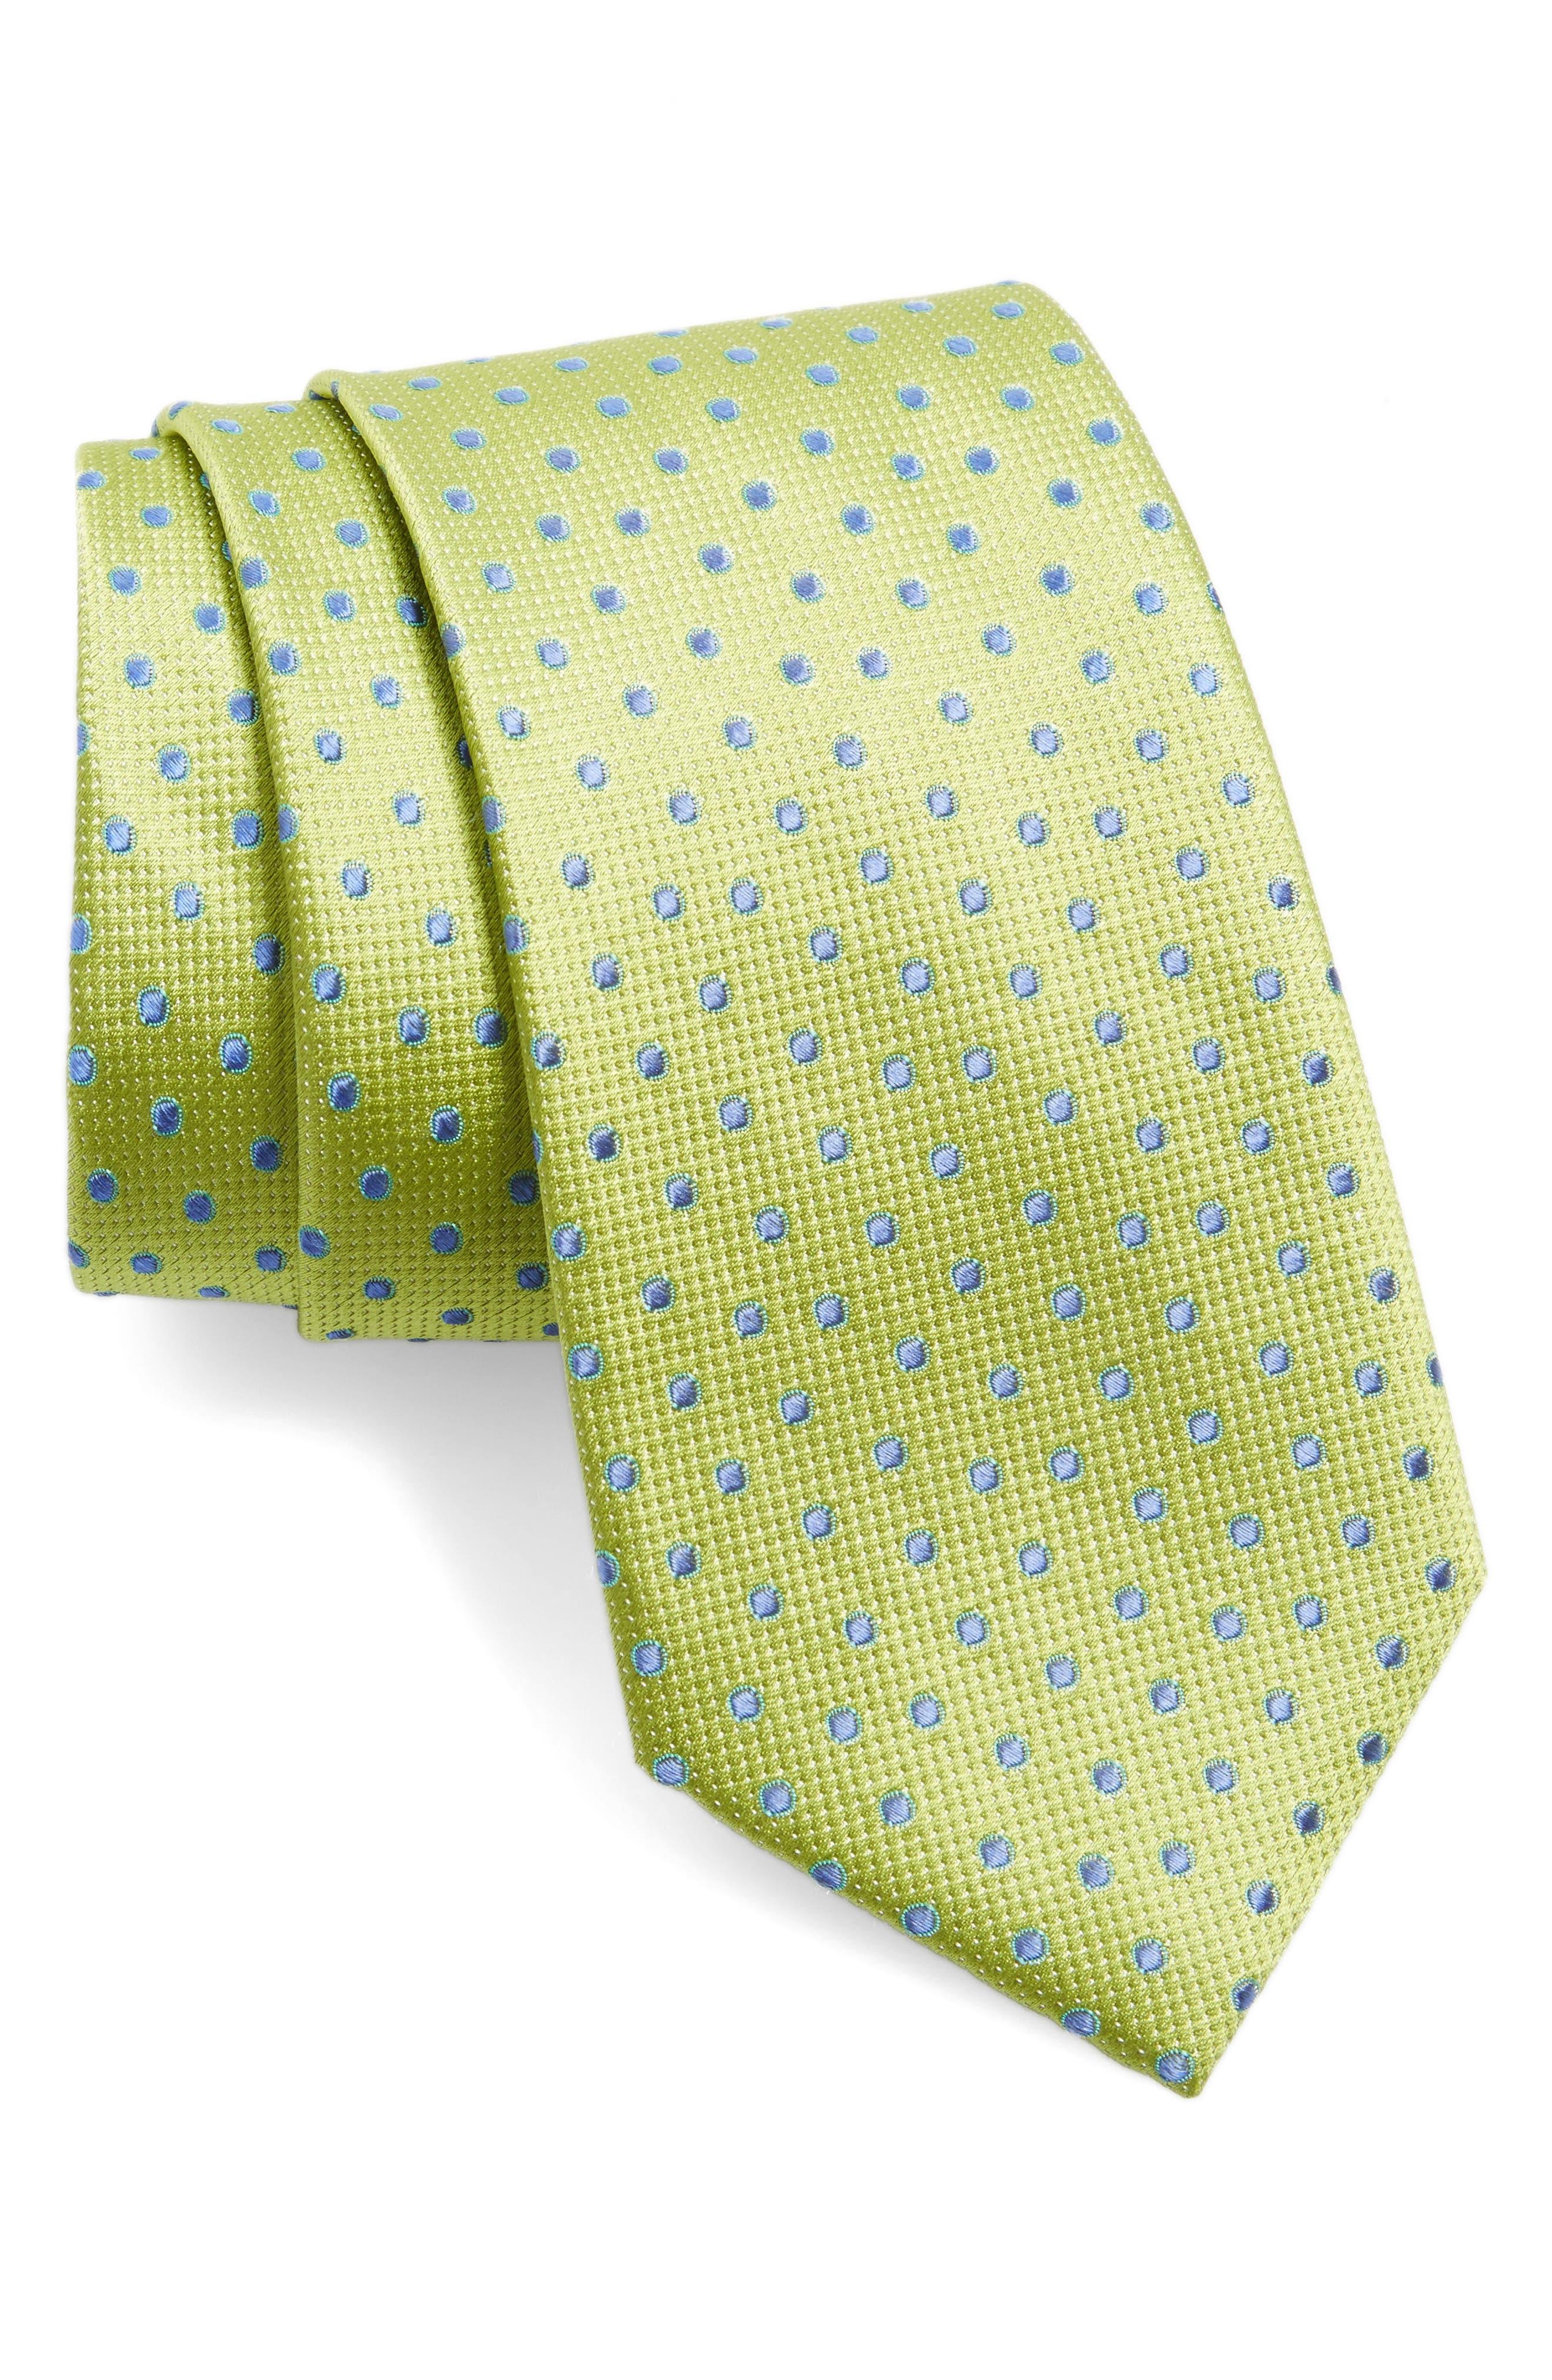 Alternate Image 1 Selected - Nordstrom Men's Shop Double Dot Silk Tie